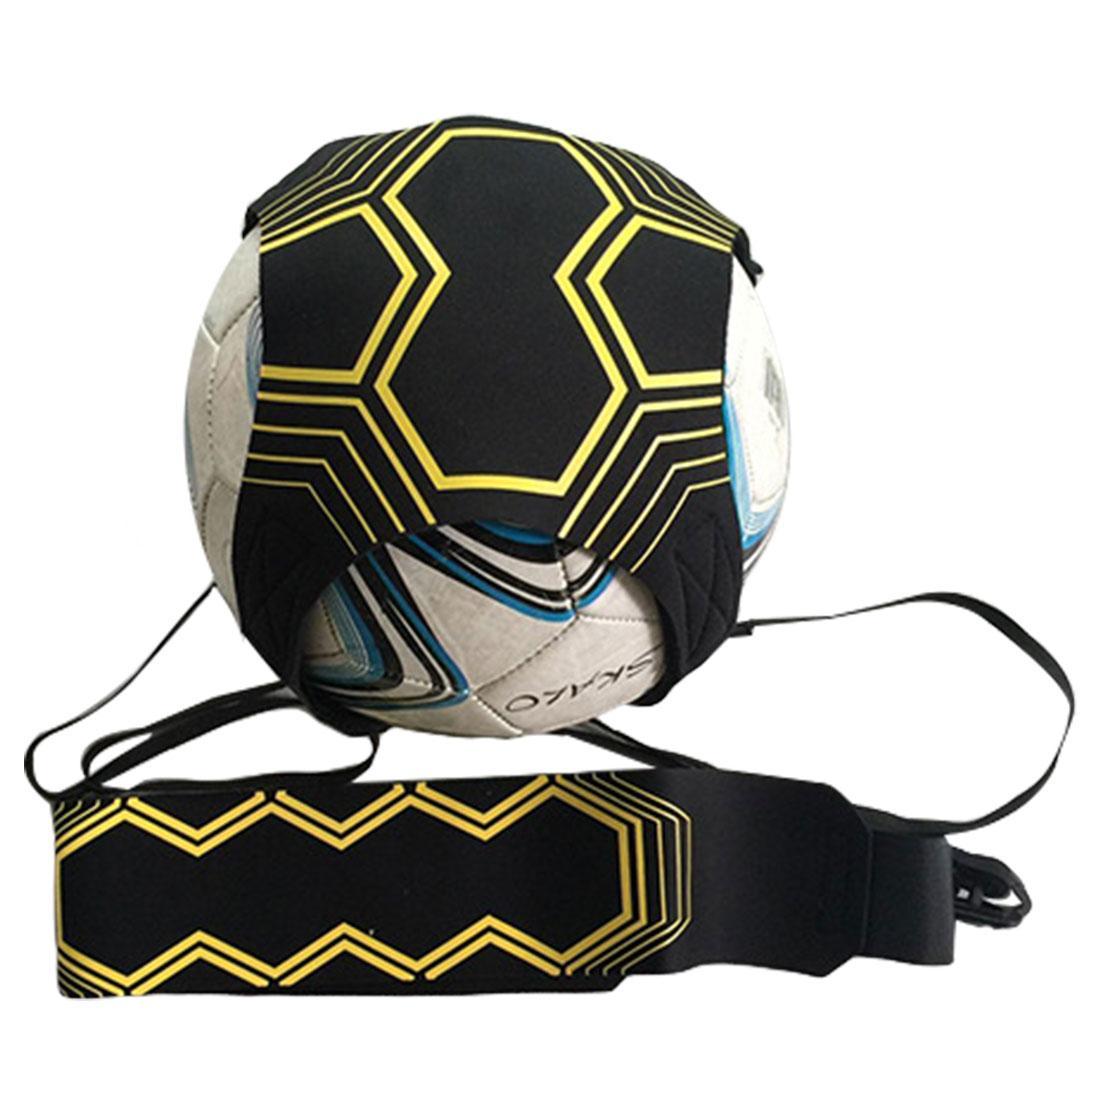 397c1cf0e97 Hot Sale Adjustable Football Trainer Sports Assistance 94cm Soccer Ball  Practice Belt Training Equipment Kick Accessories